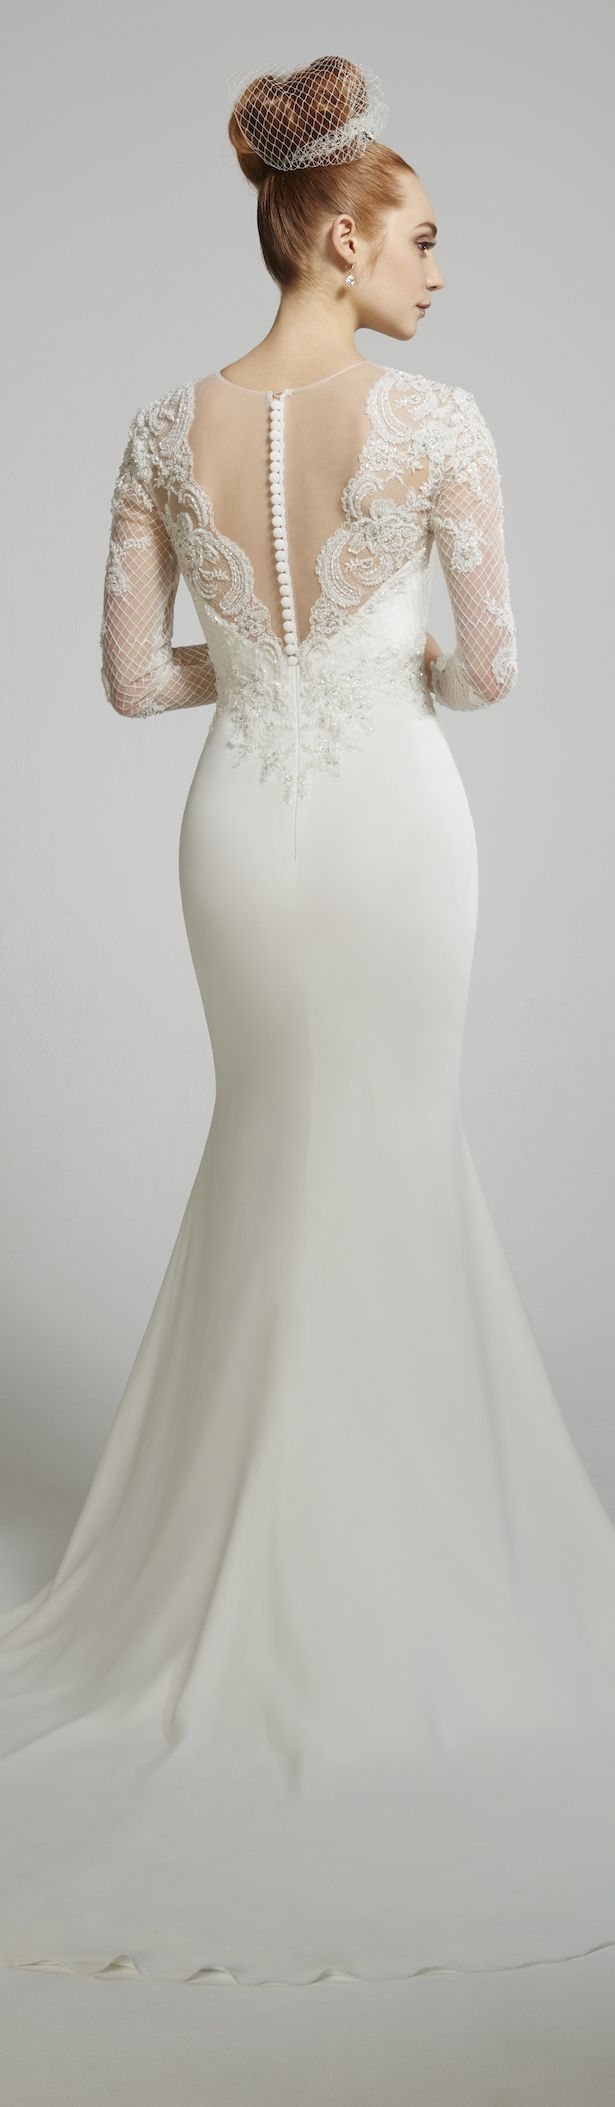 Matty 2016 by Matthew Christopher Bridal Collection - Carrington Wedding Dress